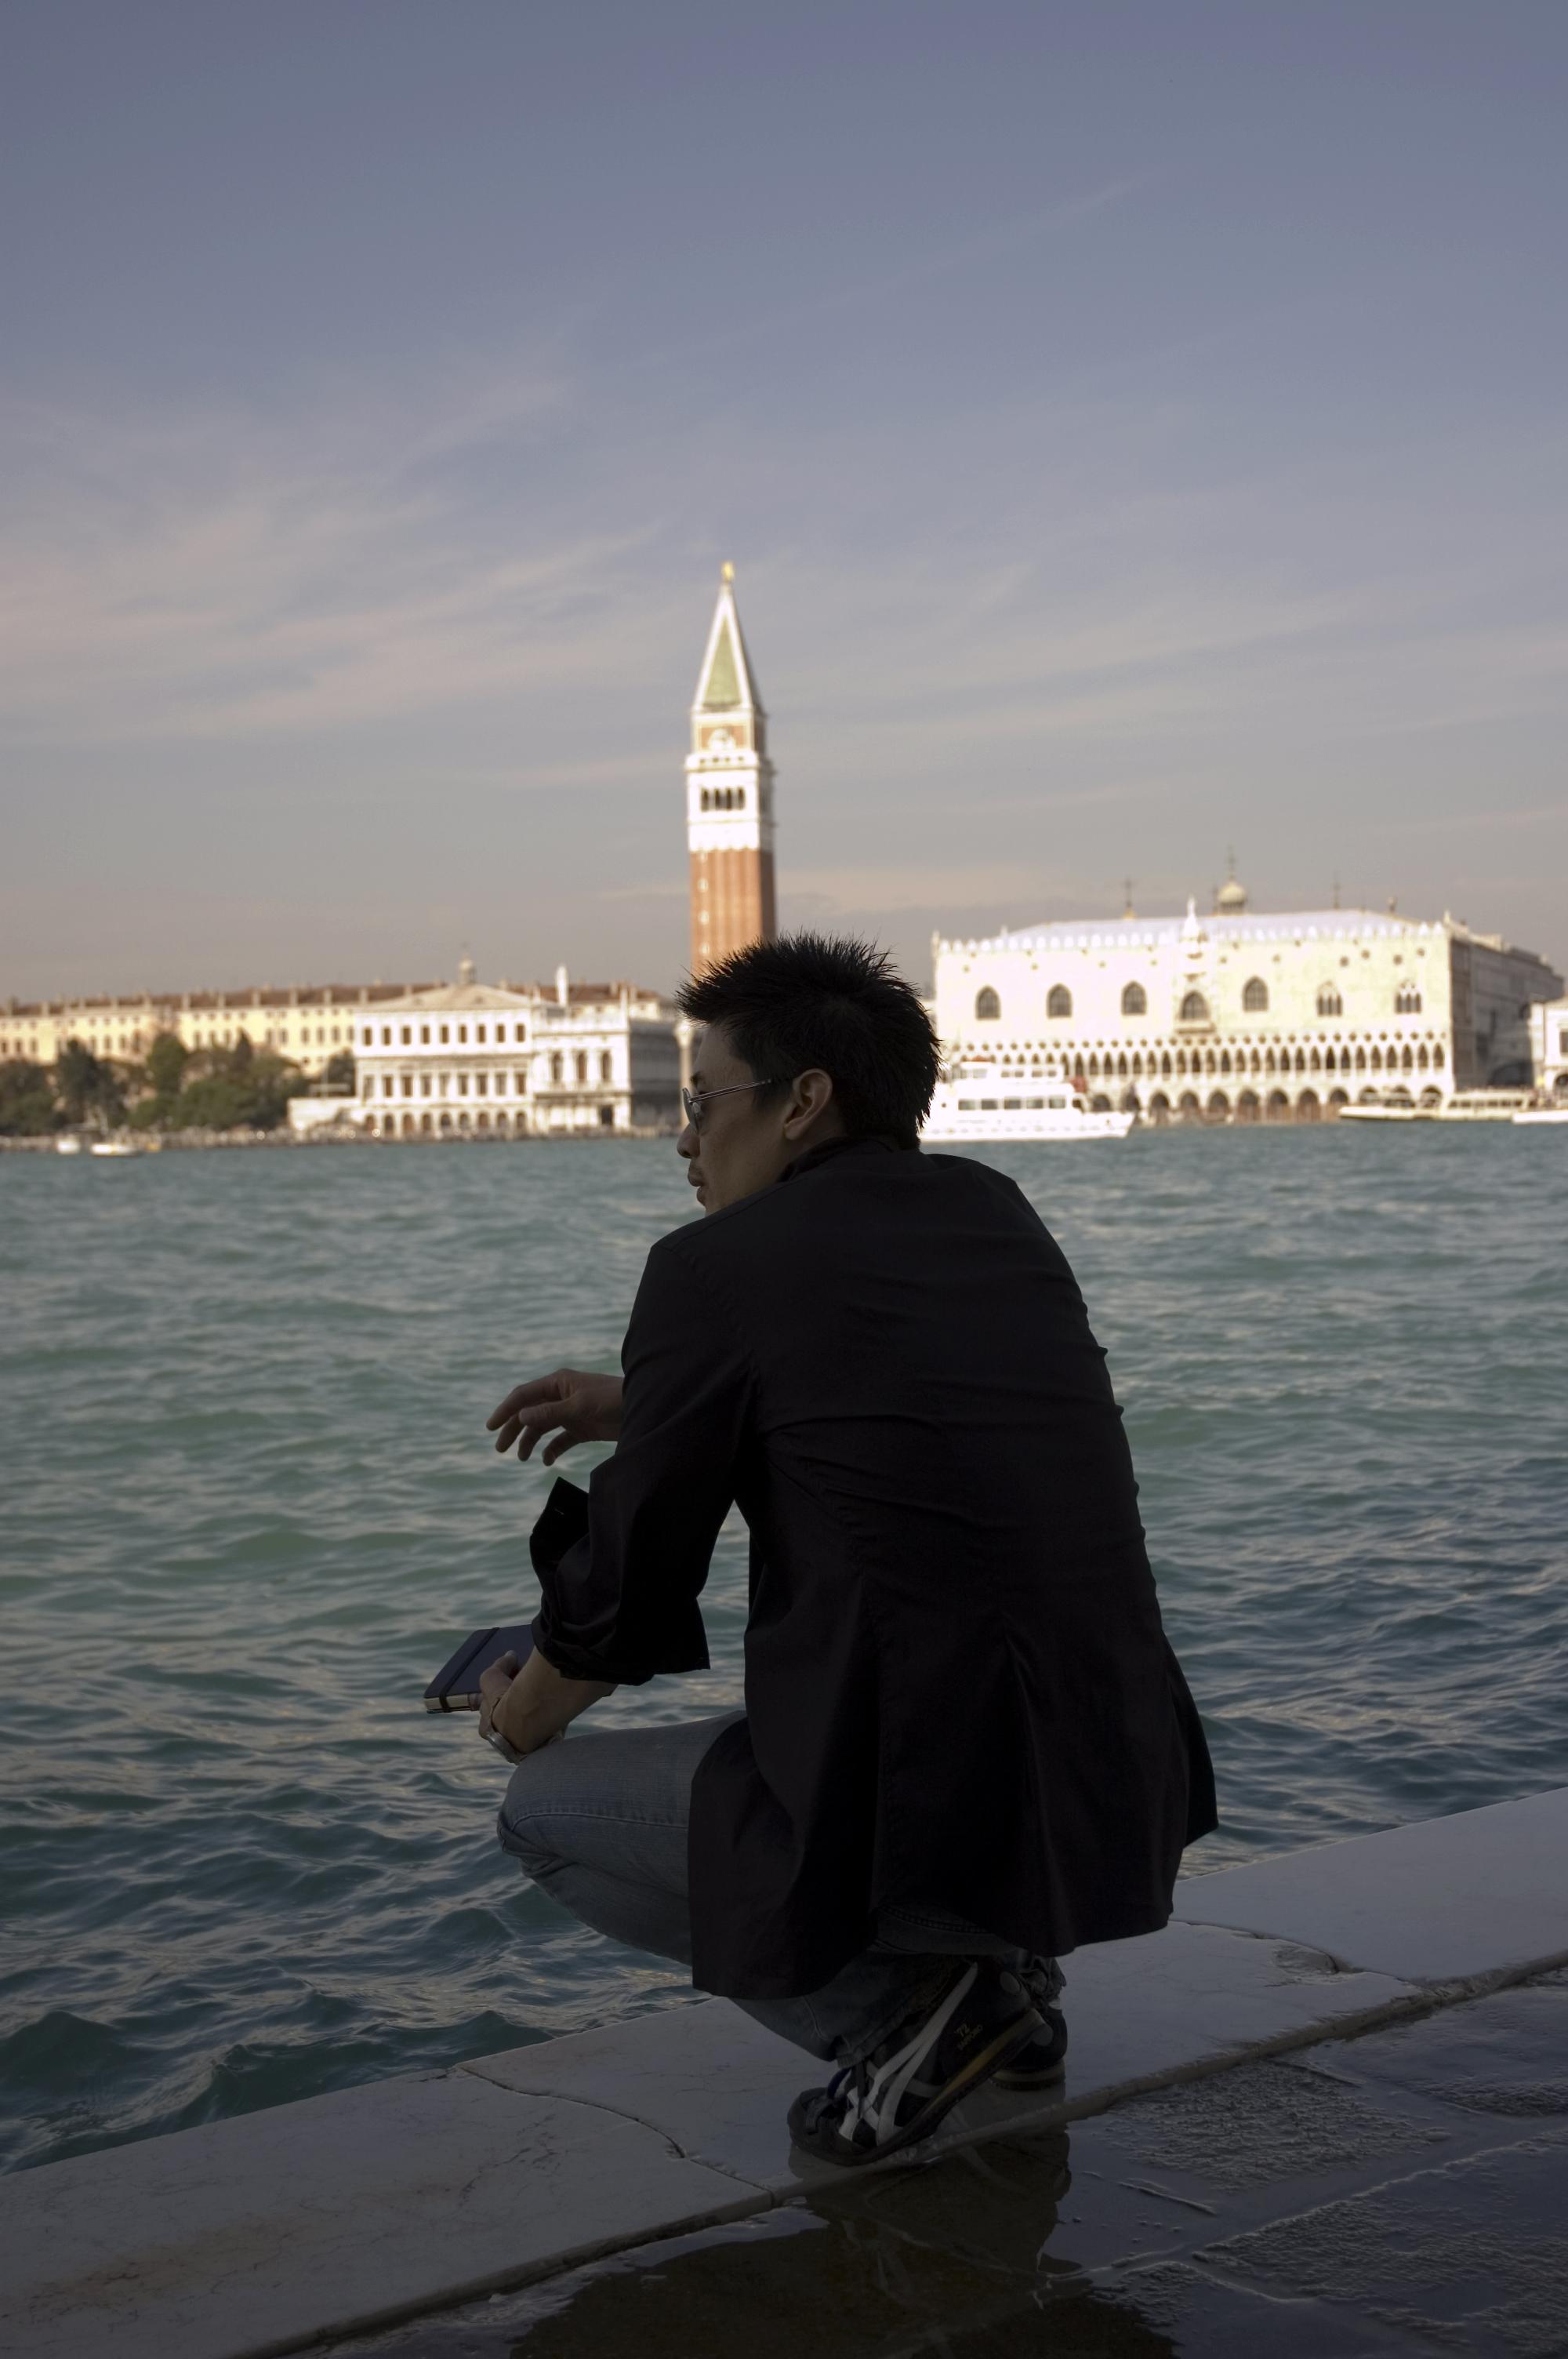 Edge..., Sea, Venice, Viewing, Water, HQ Photo